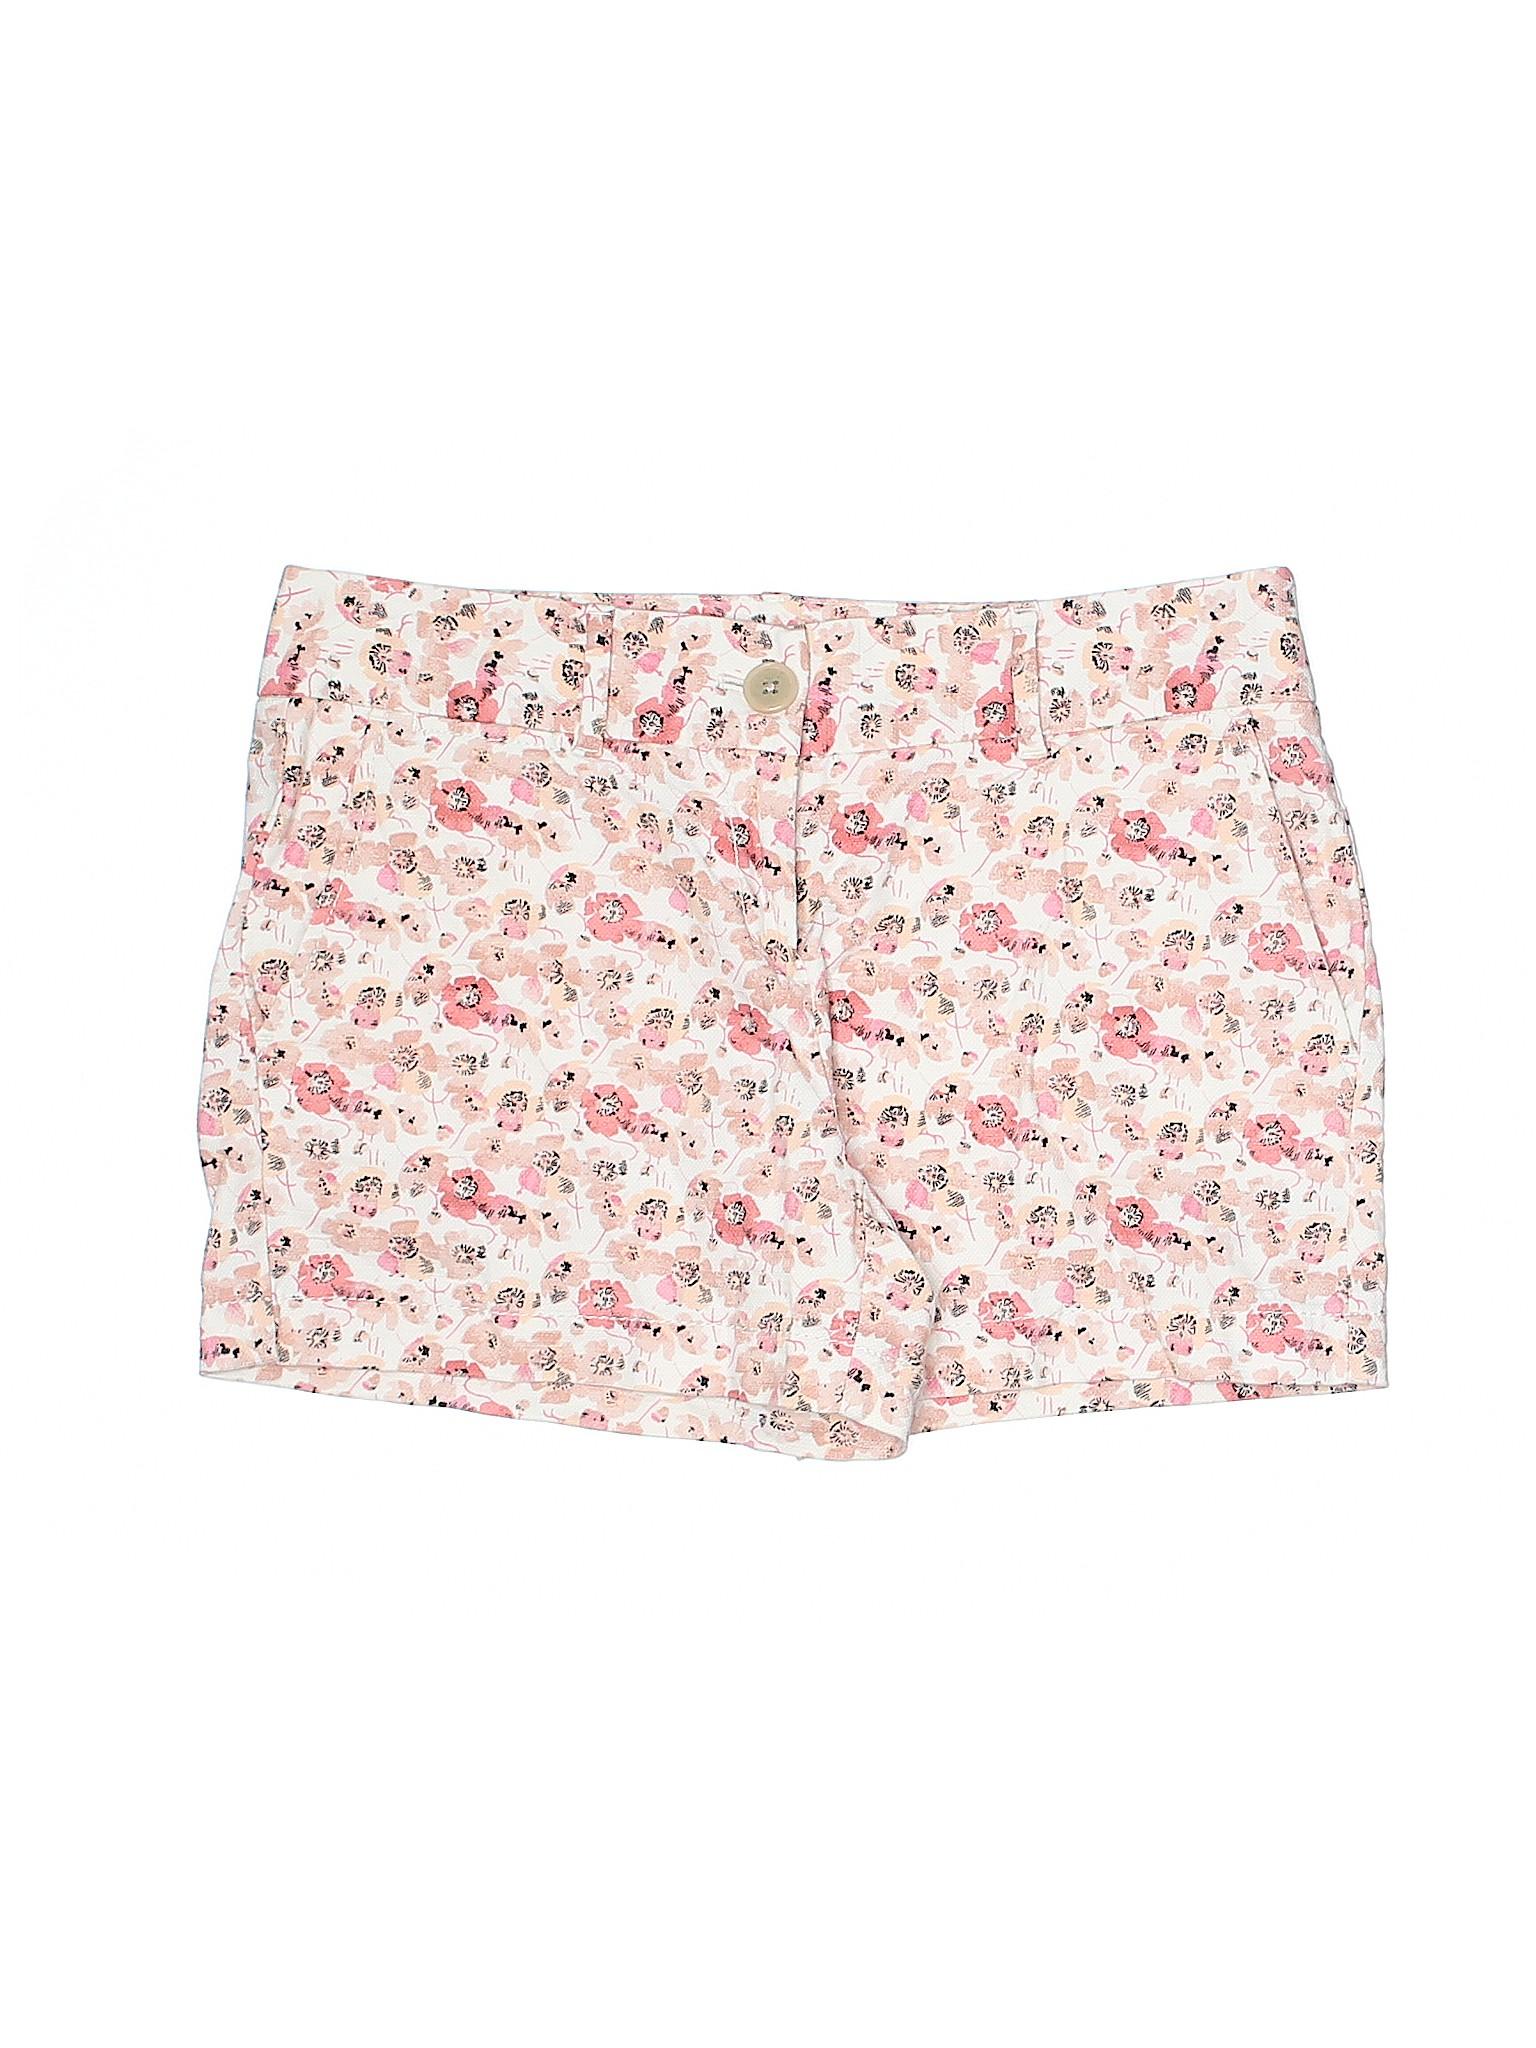 Boutique Shorts Ann LOFT Khaki Taylor YHnOwvrqgY